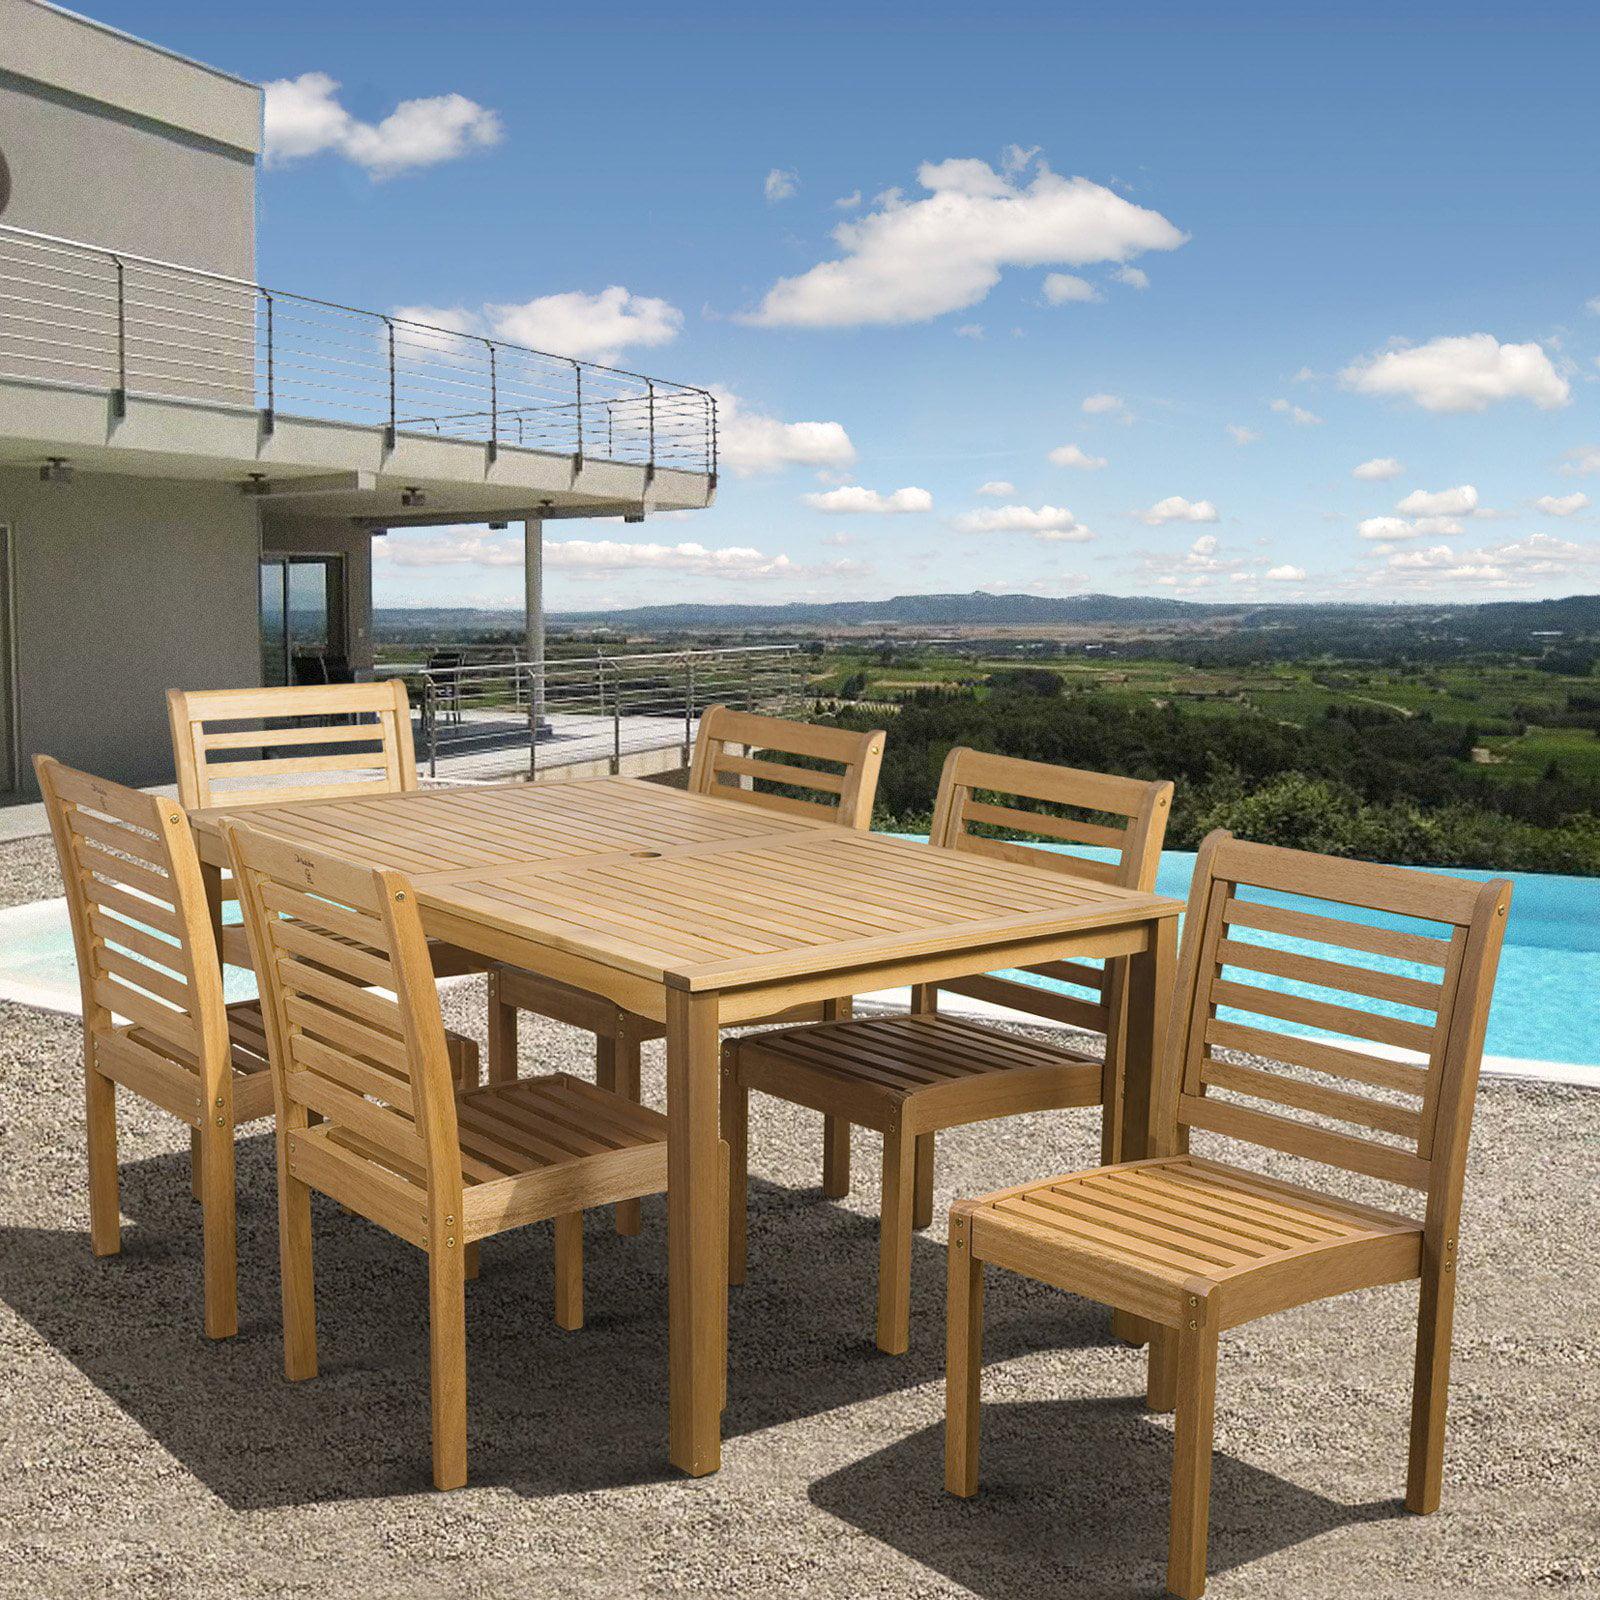 Amazonia Milano Eucalyptus Rectangle Patio Dining Set - Seats 6